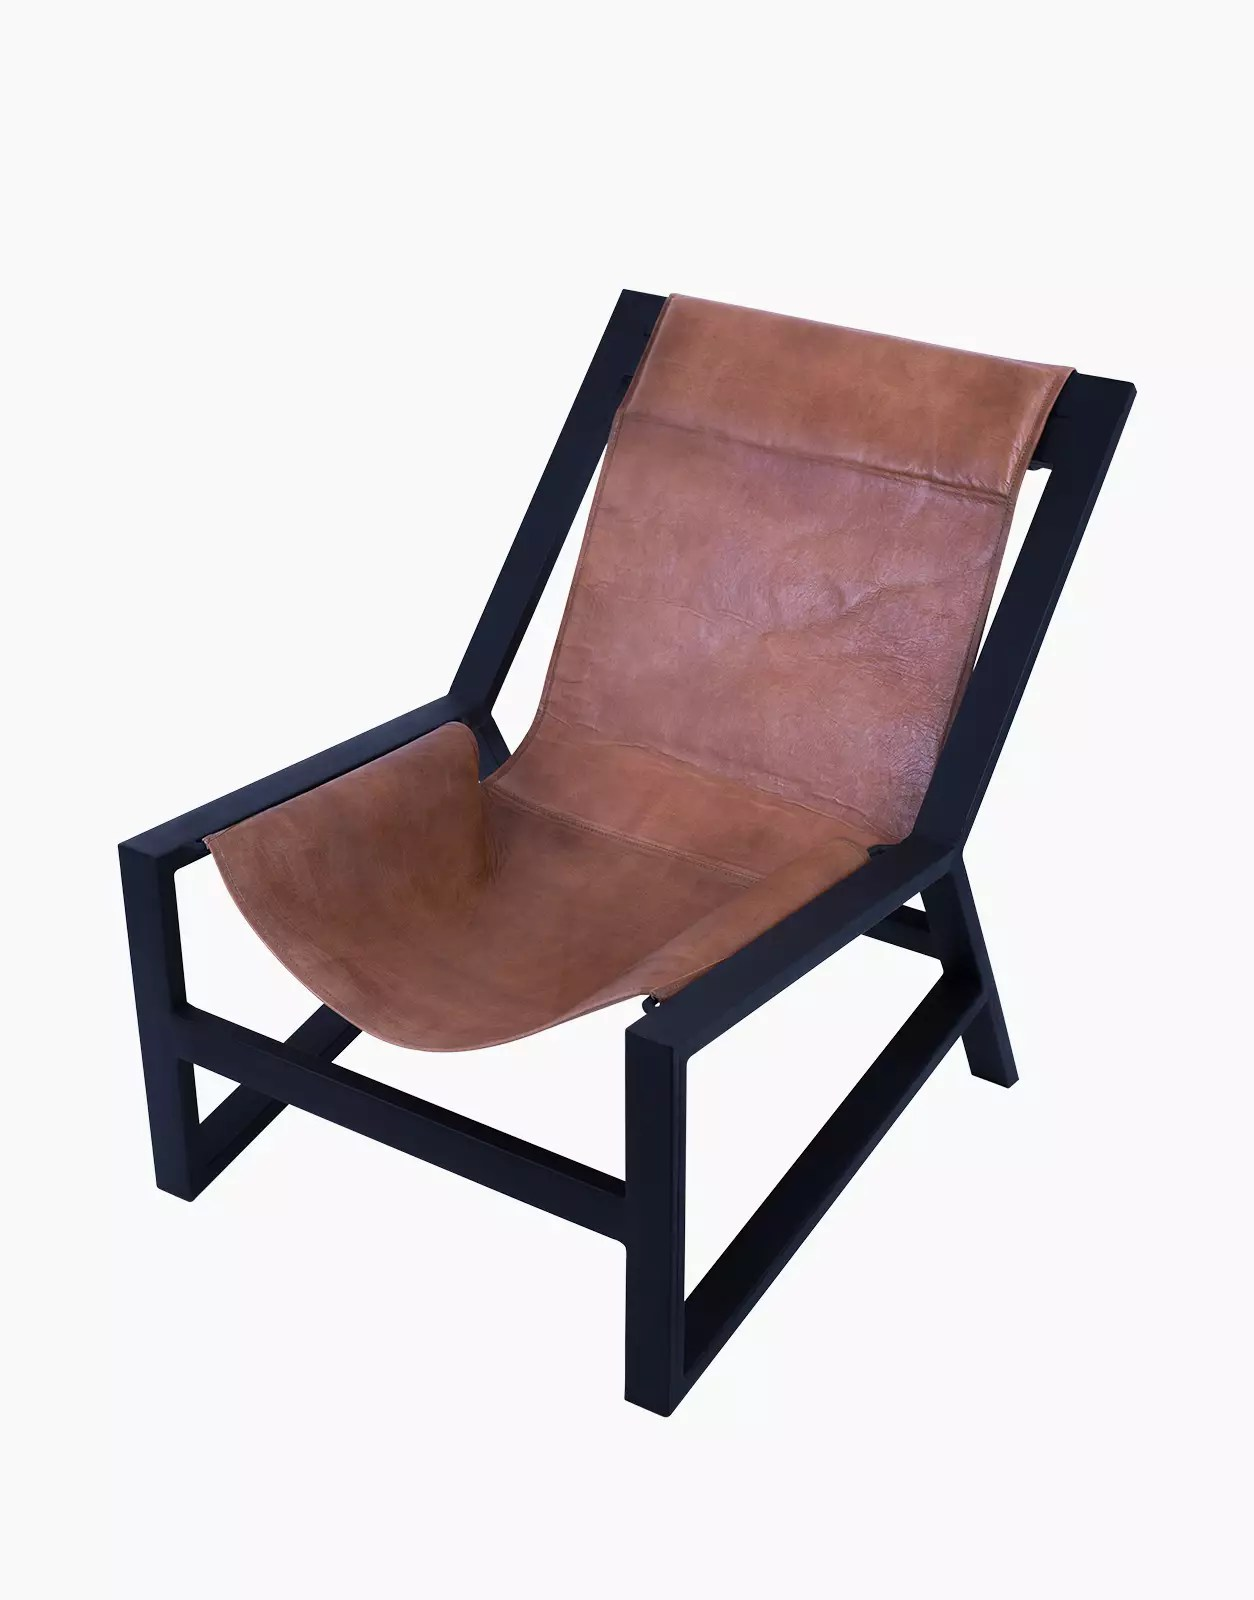 meilleur site web ea328 bc621 Relax chair - Solution-design.fr - Furniture - Lighting - Decoration